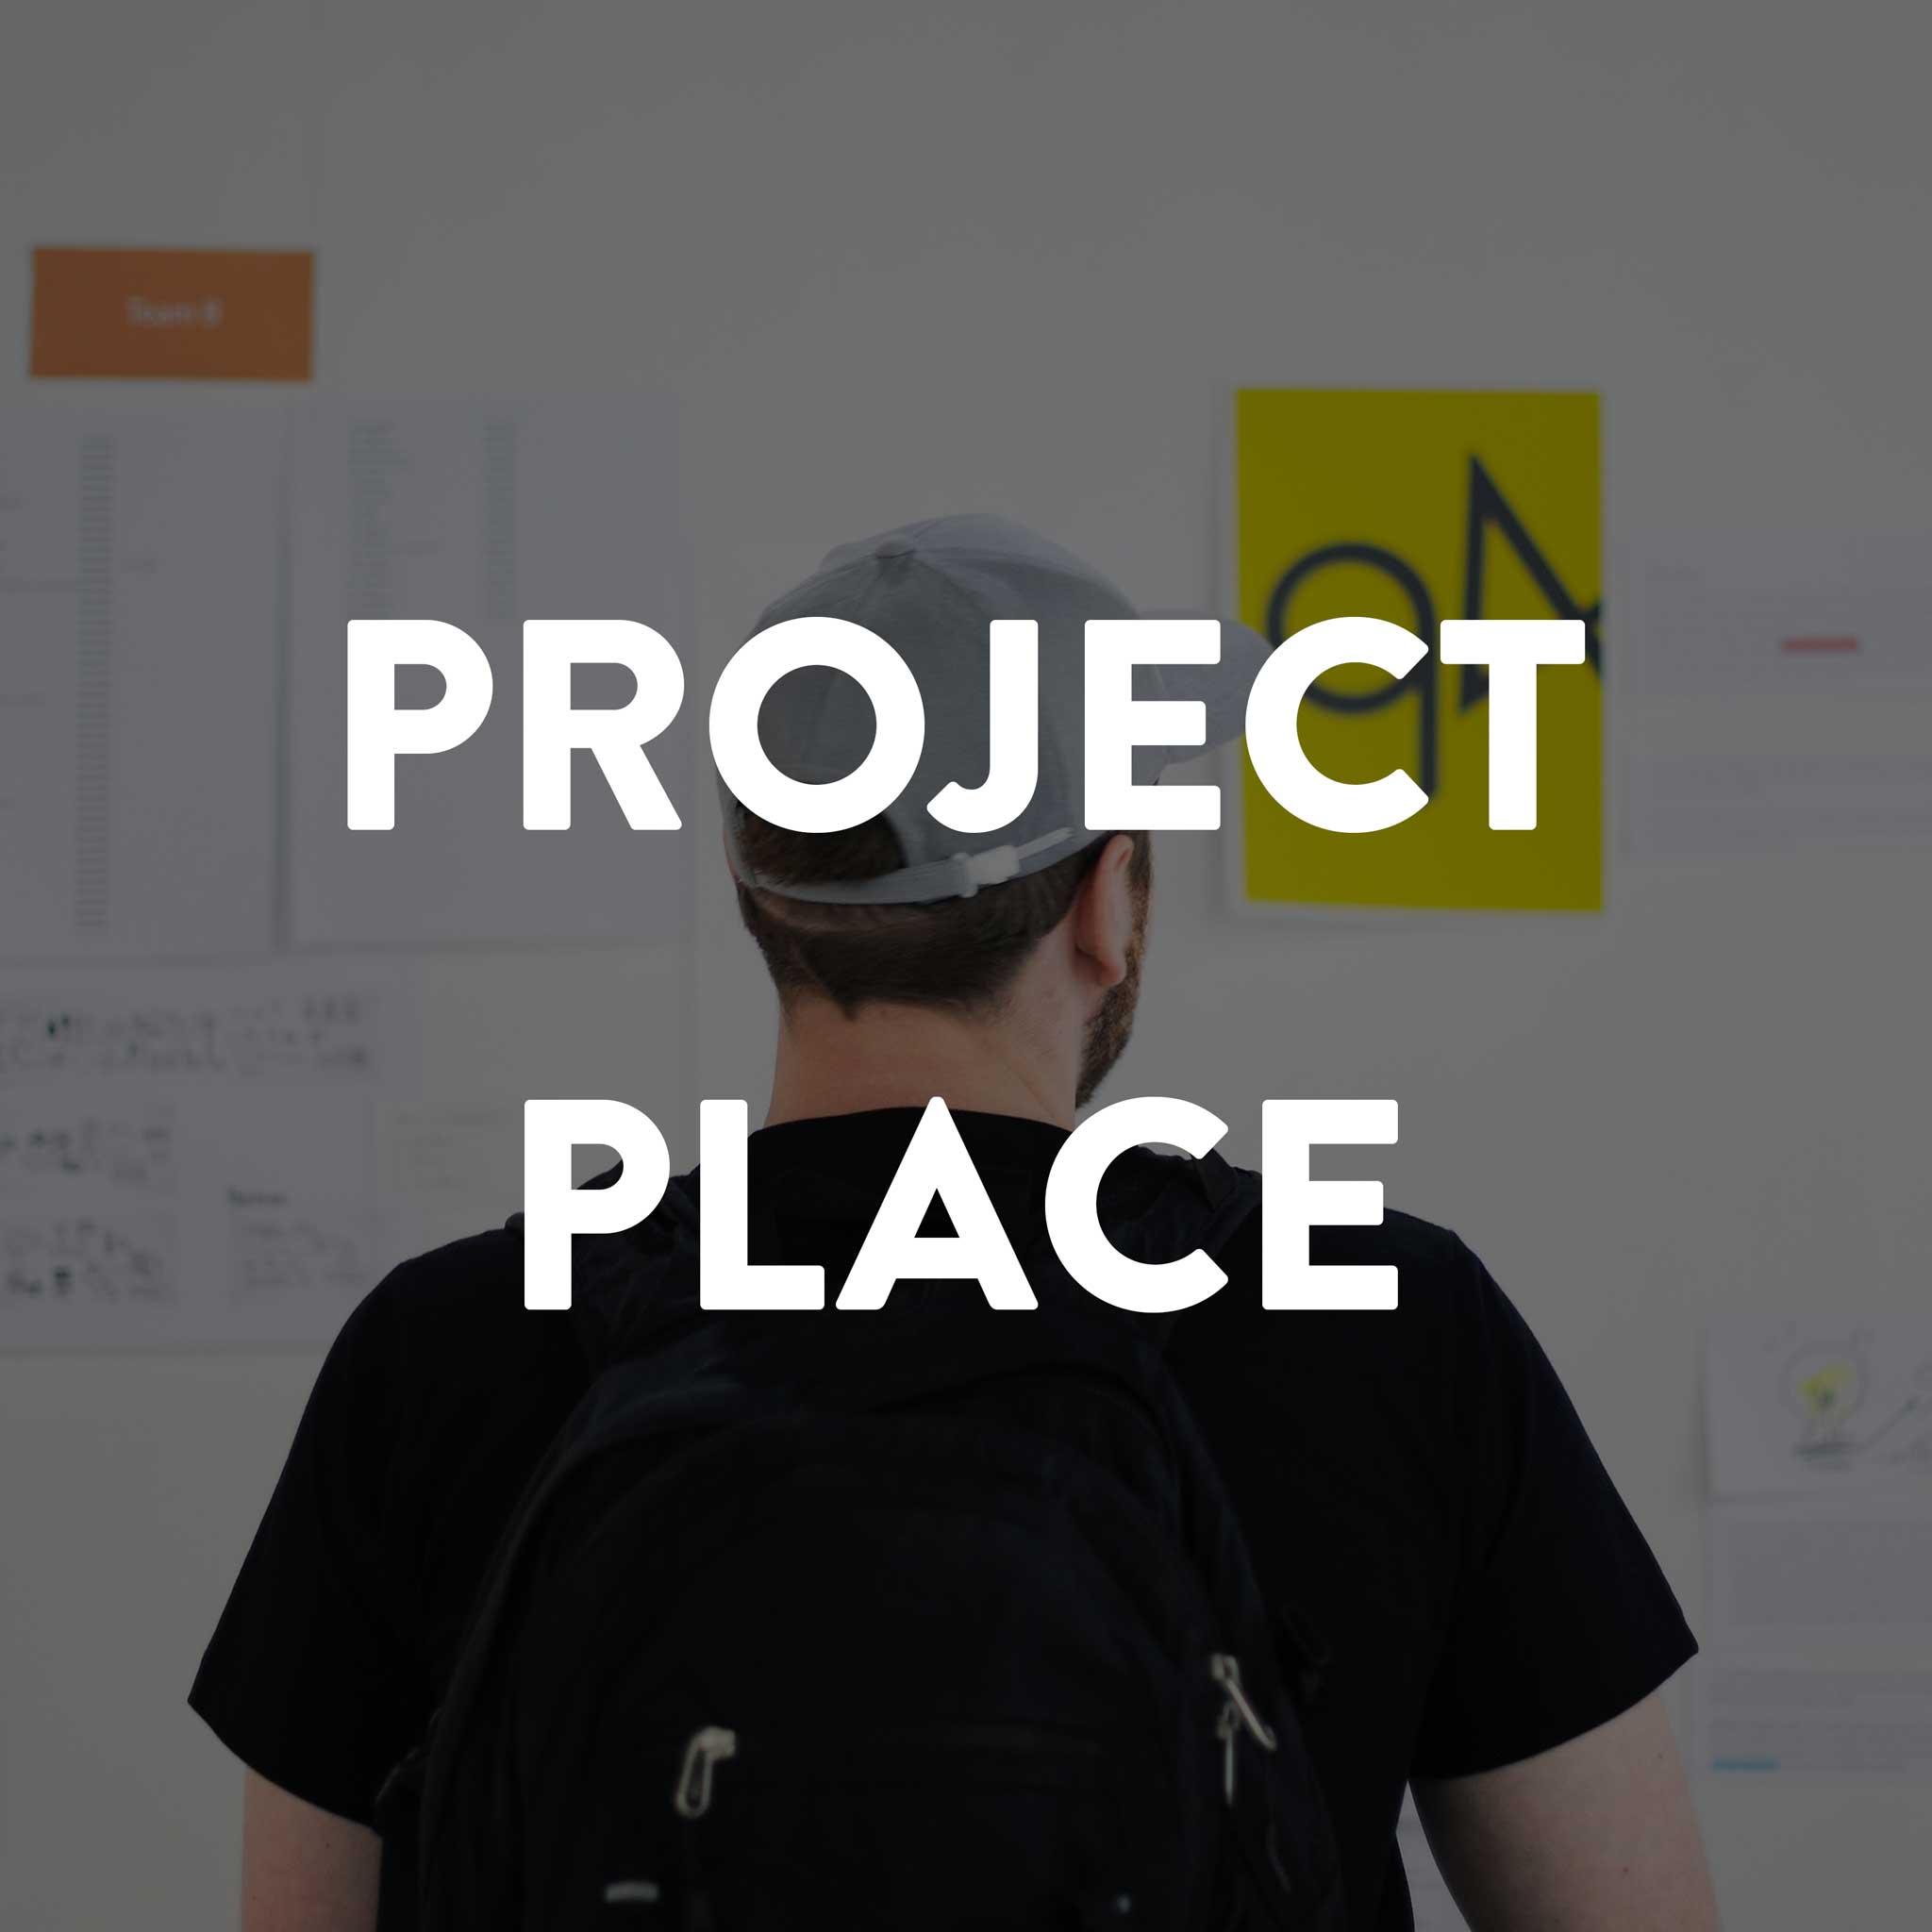 ProjectPlace.jpg